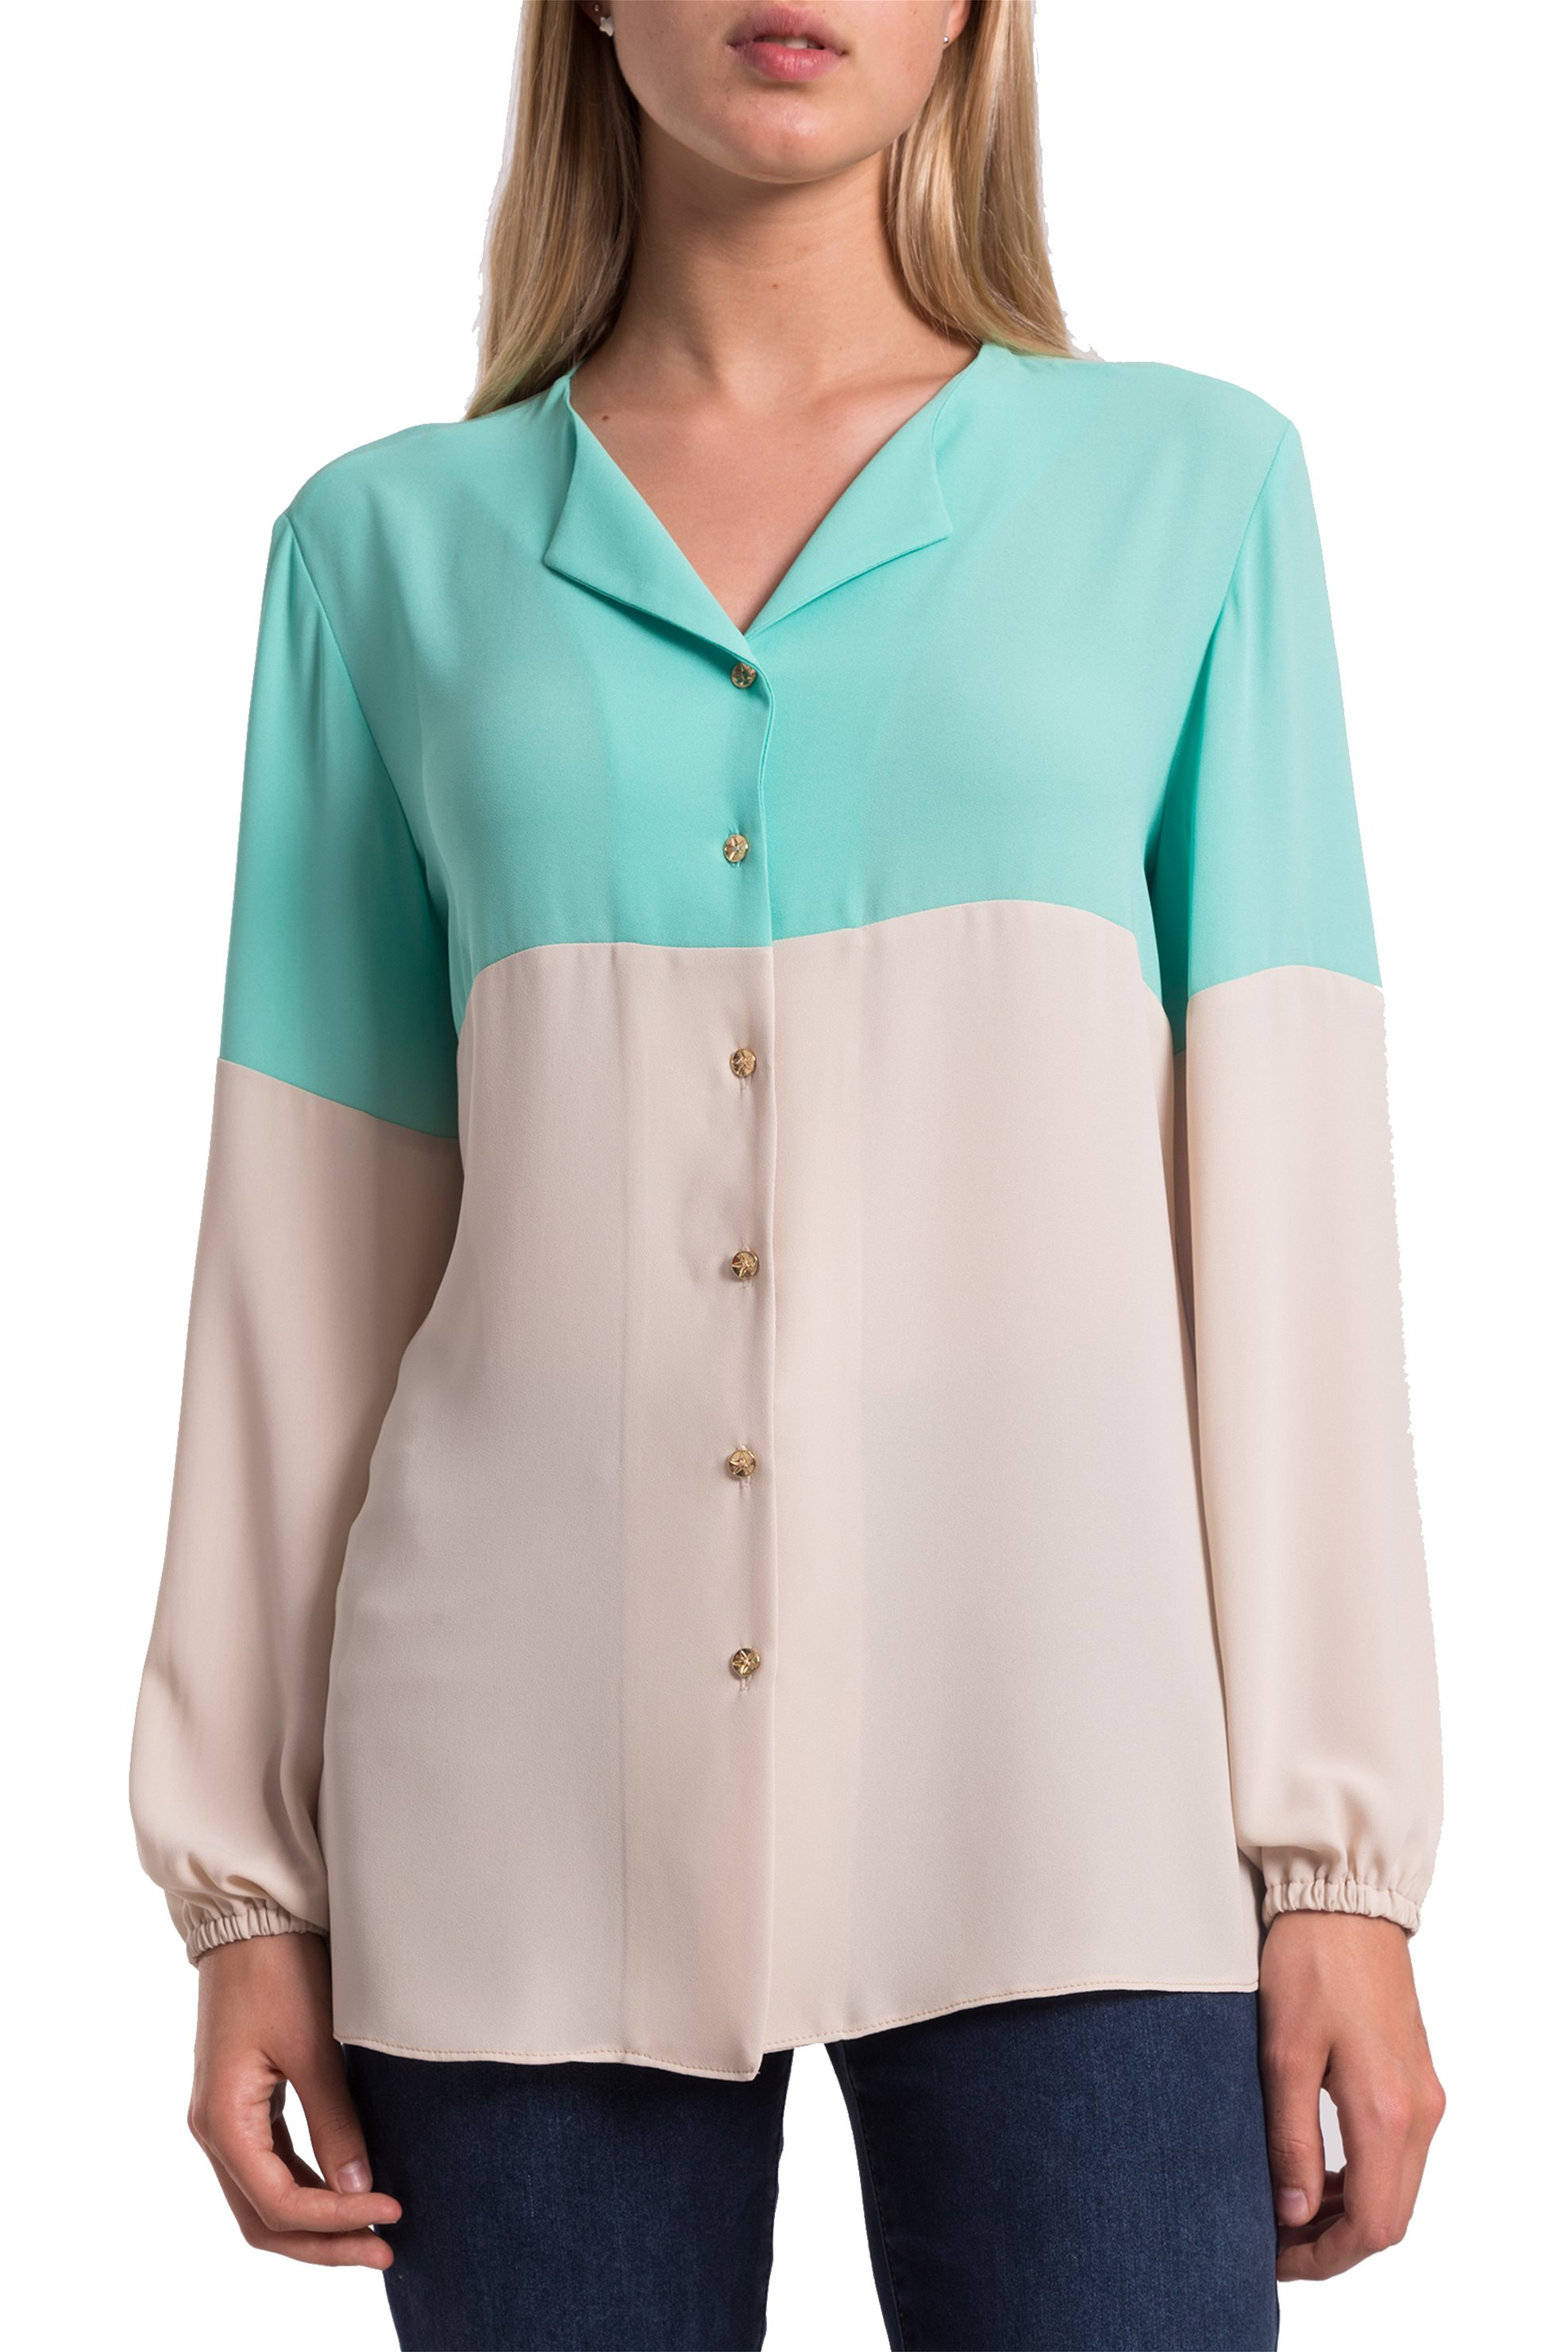 440bcba9978e Γυναικεία   Ρούχα   Πουκάμισα   Γυναικείο πουκάμισο ριγέ Gaudi ...